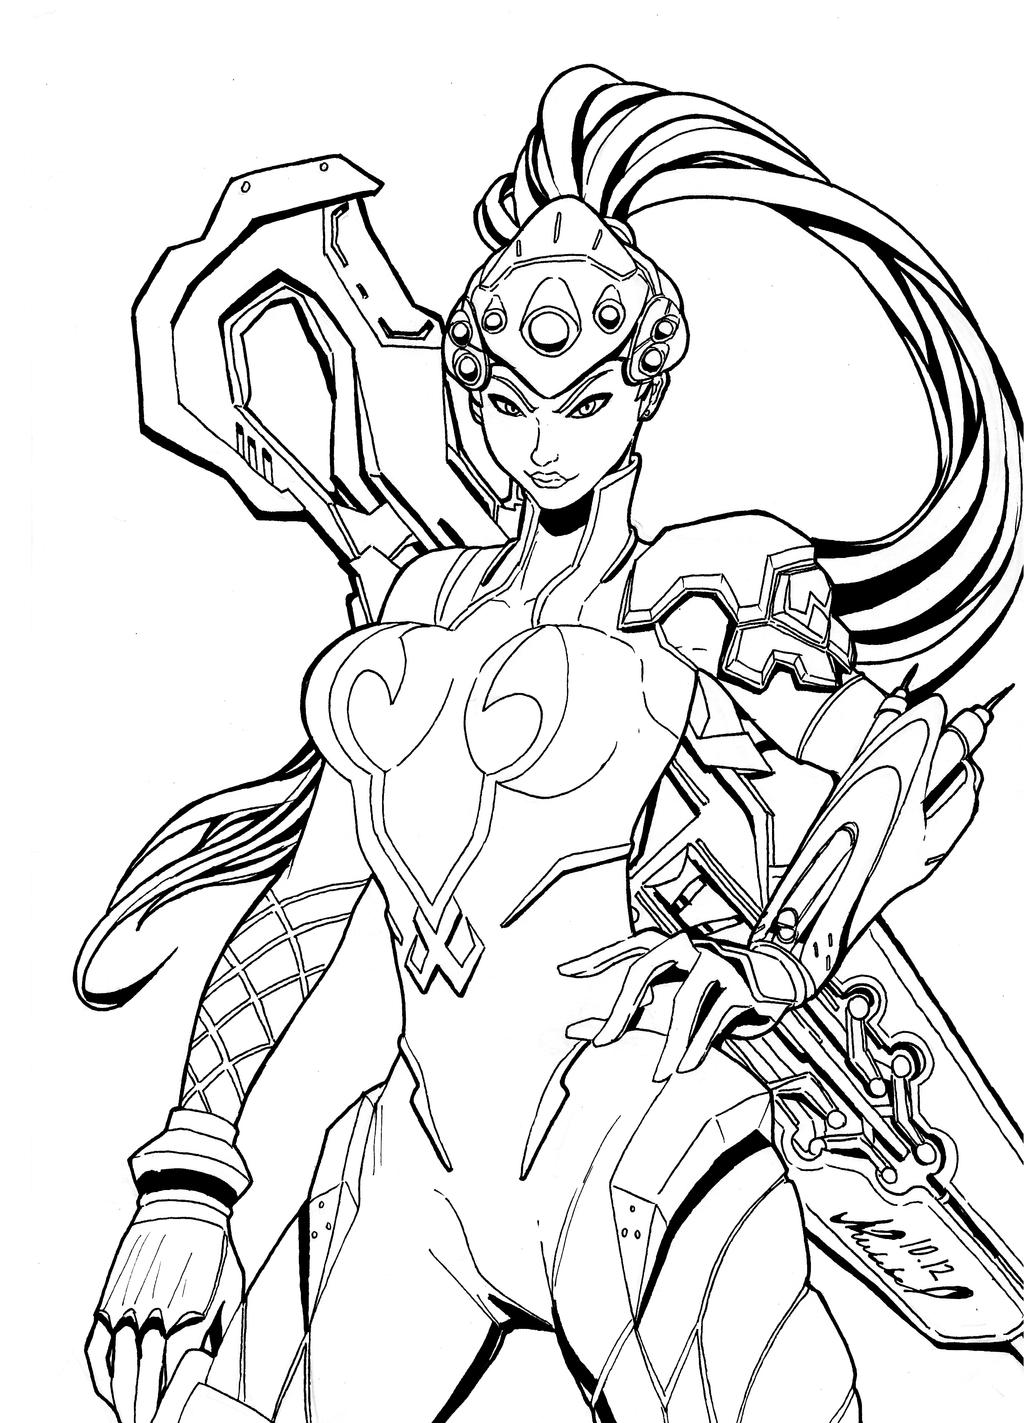 Kleurplaat Overwatch Doomfist Widow Overwatch By Abylaikhan On Deviantart